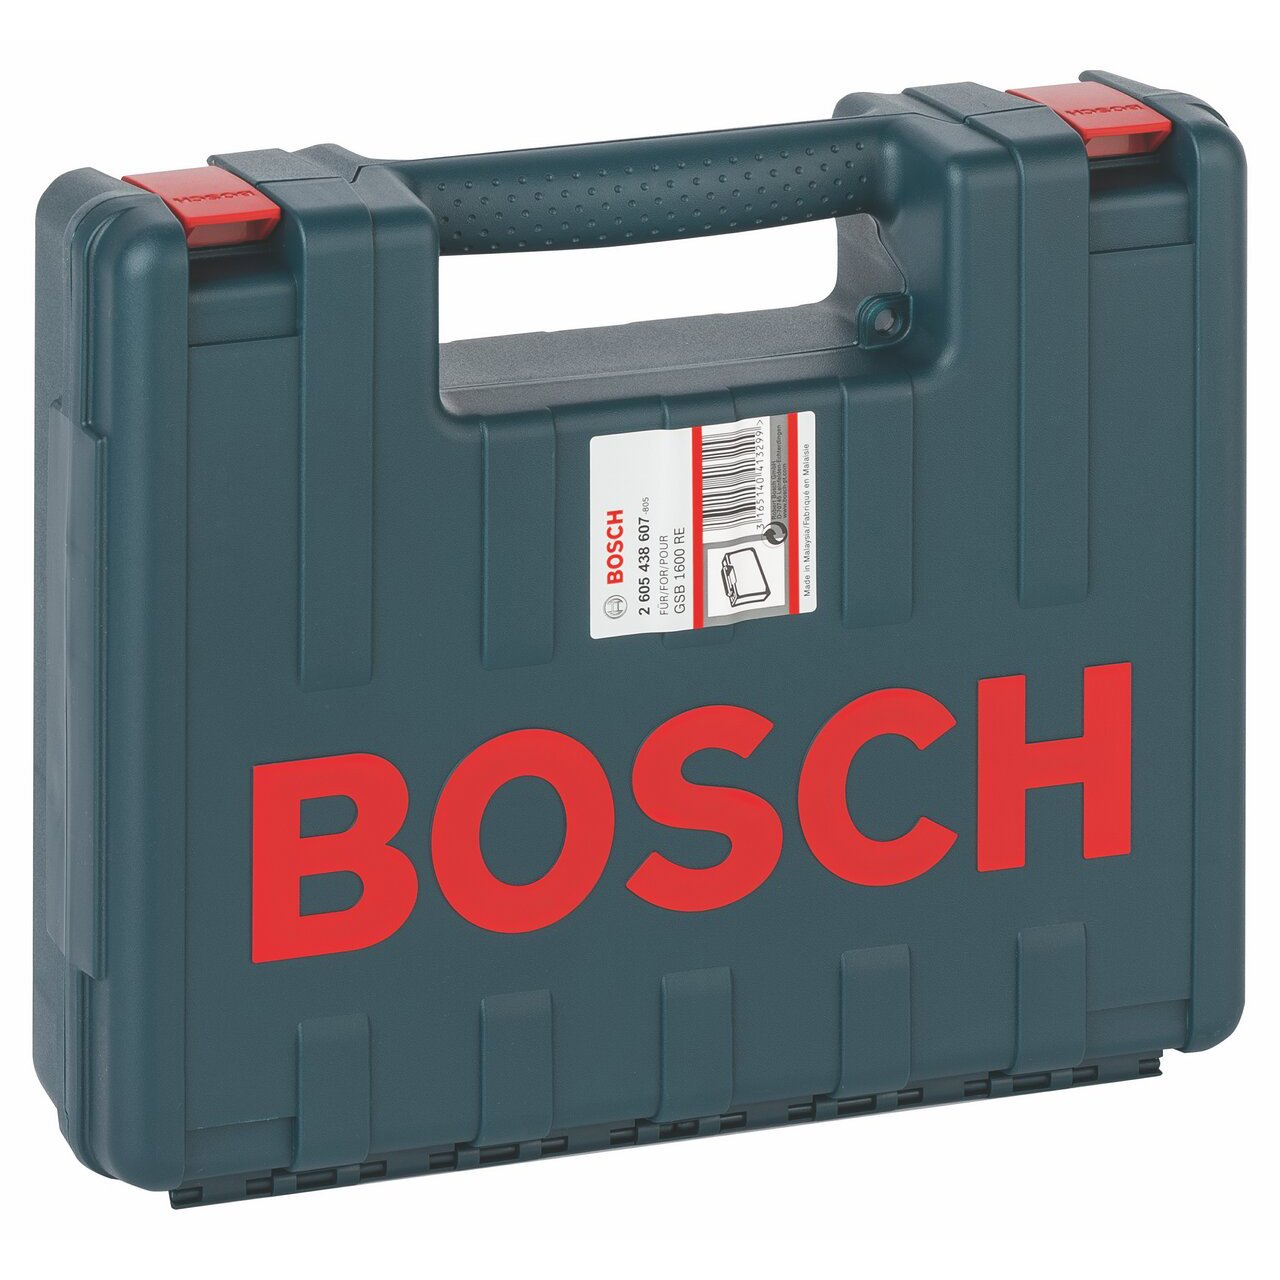 Bosch 2 605 438 607 - Maletín de transporte, 350 x 294 x 105 mm